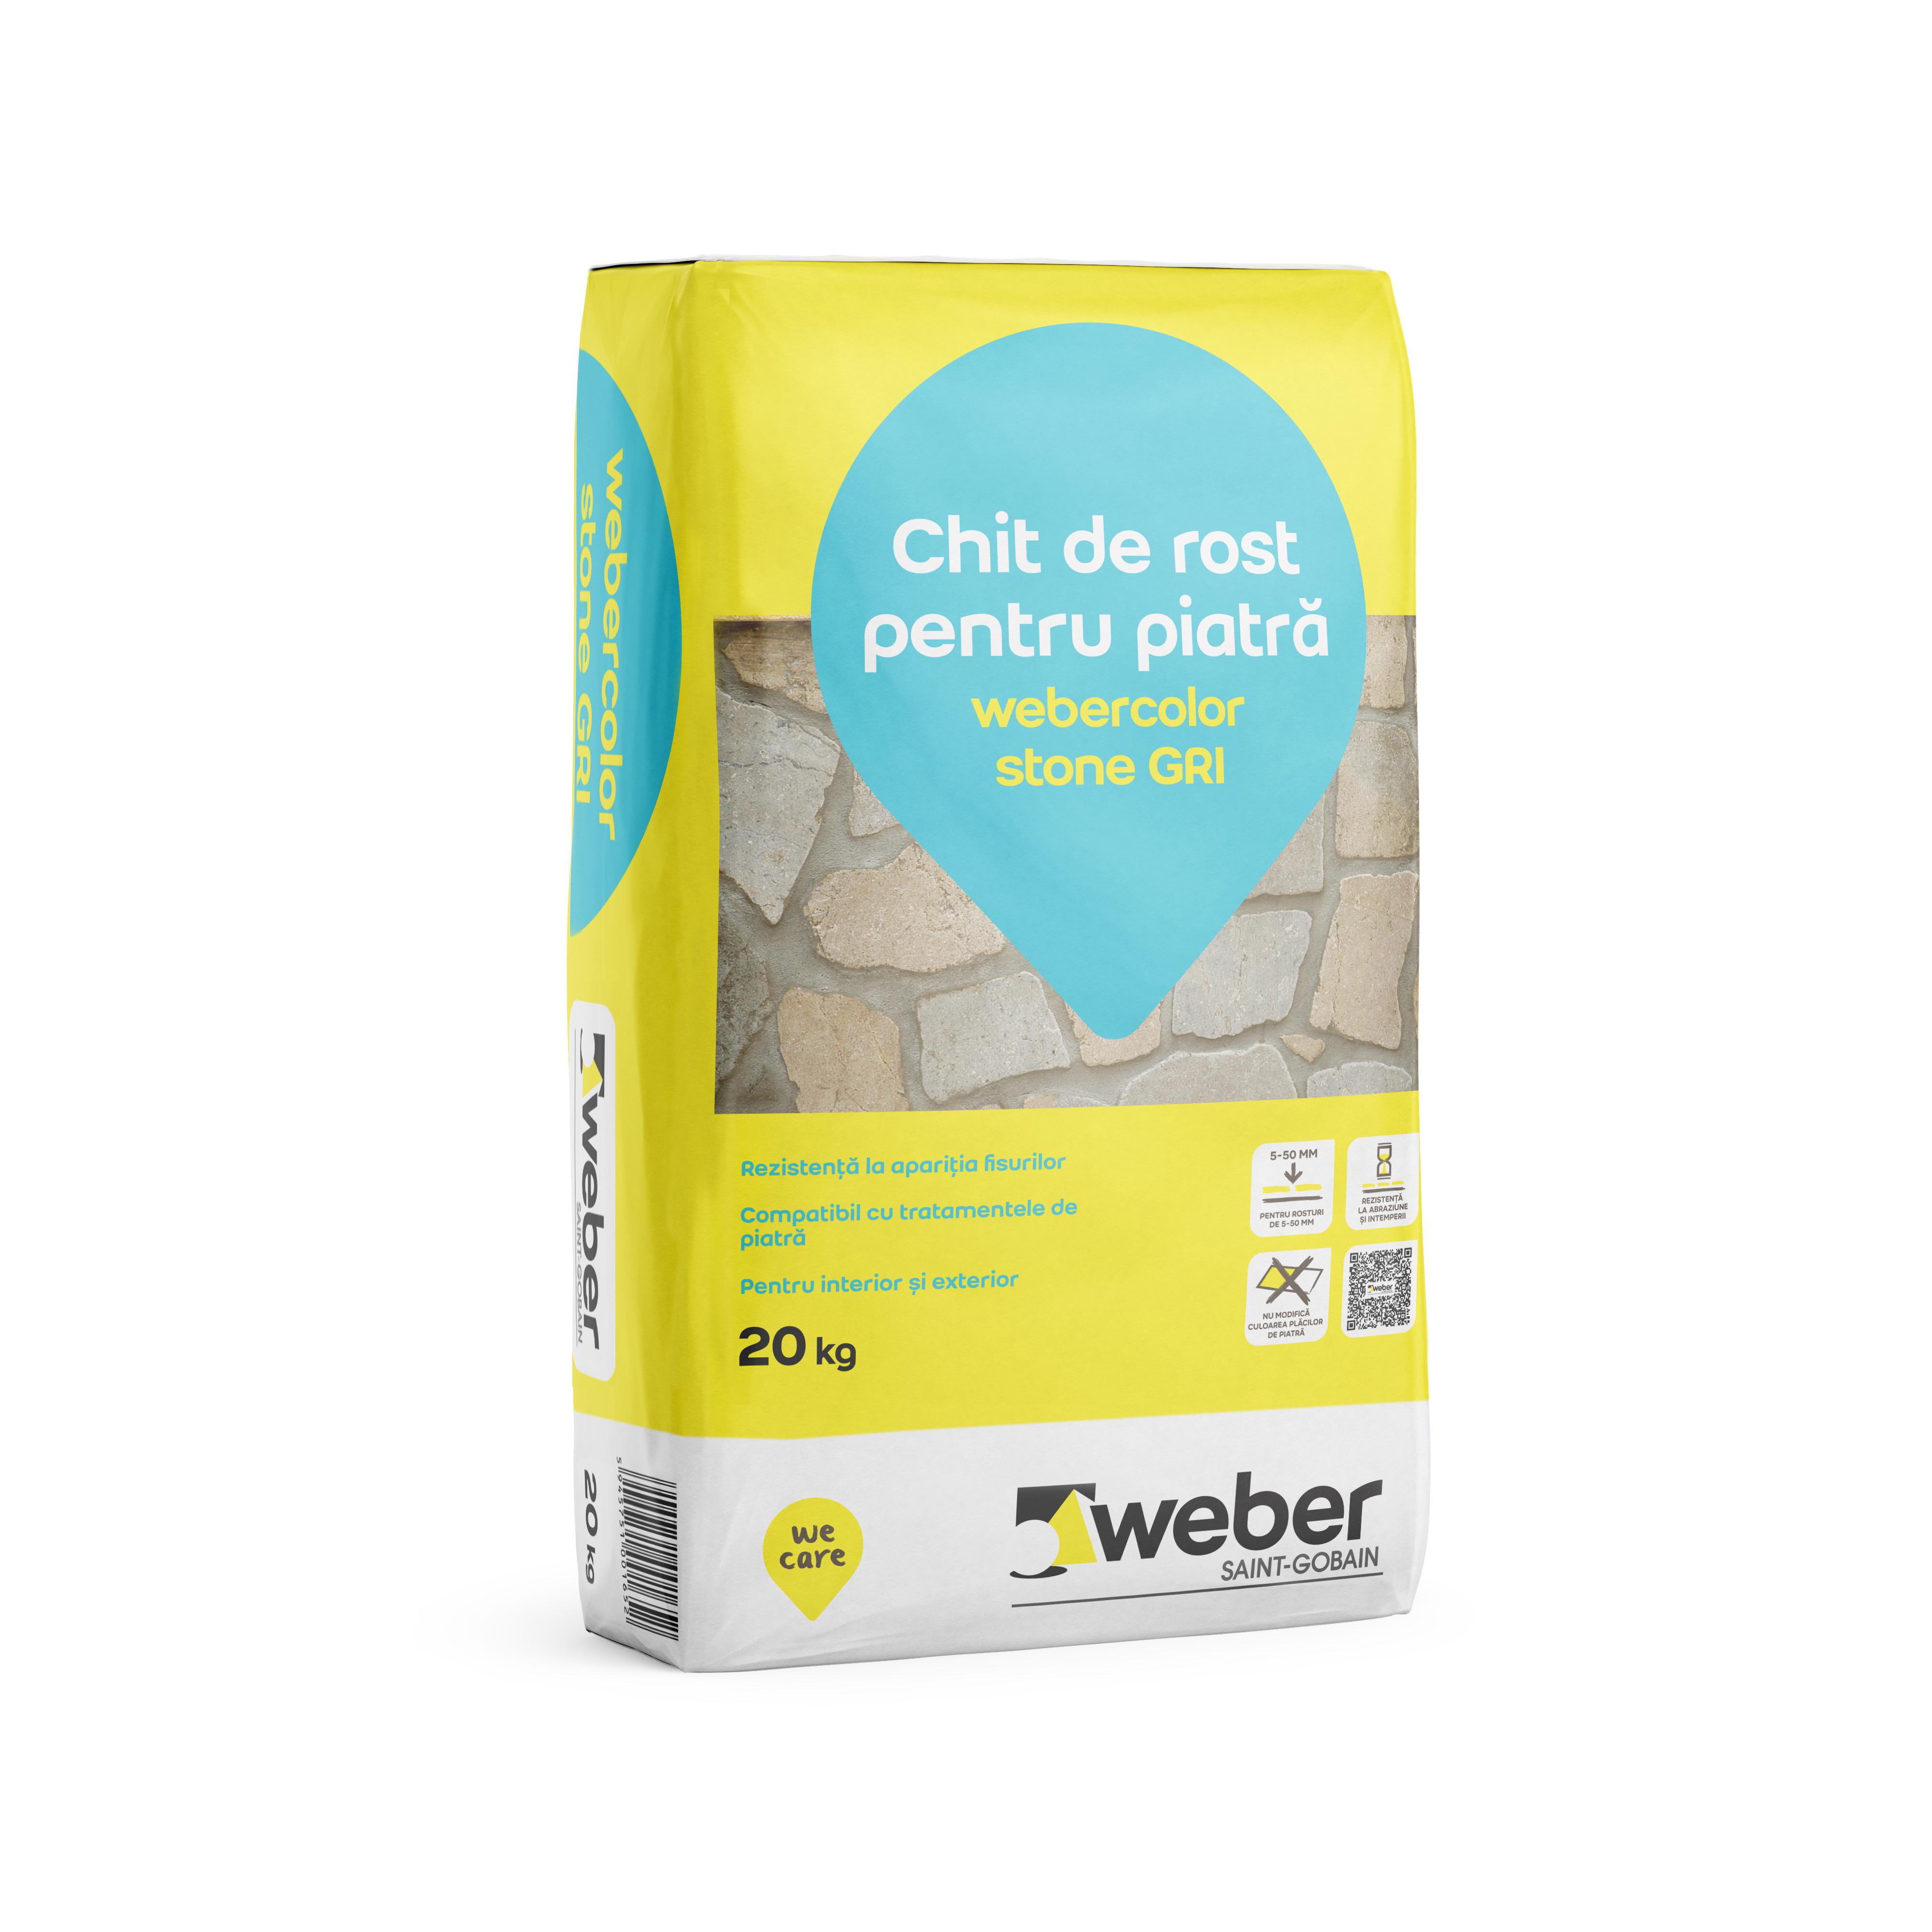 Chit de rosturi pentru piatra naturala, Weber Color Stone, gri, 20 kg